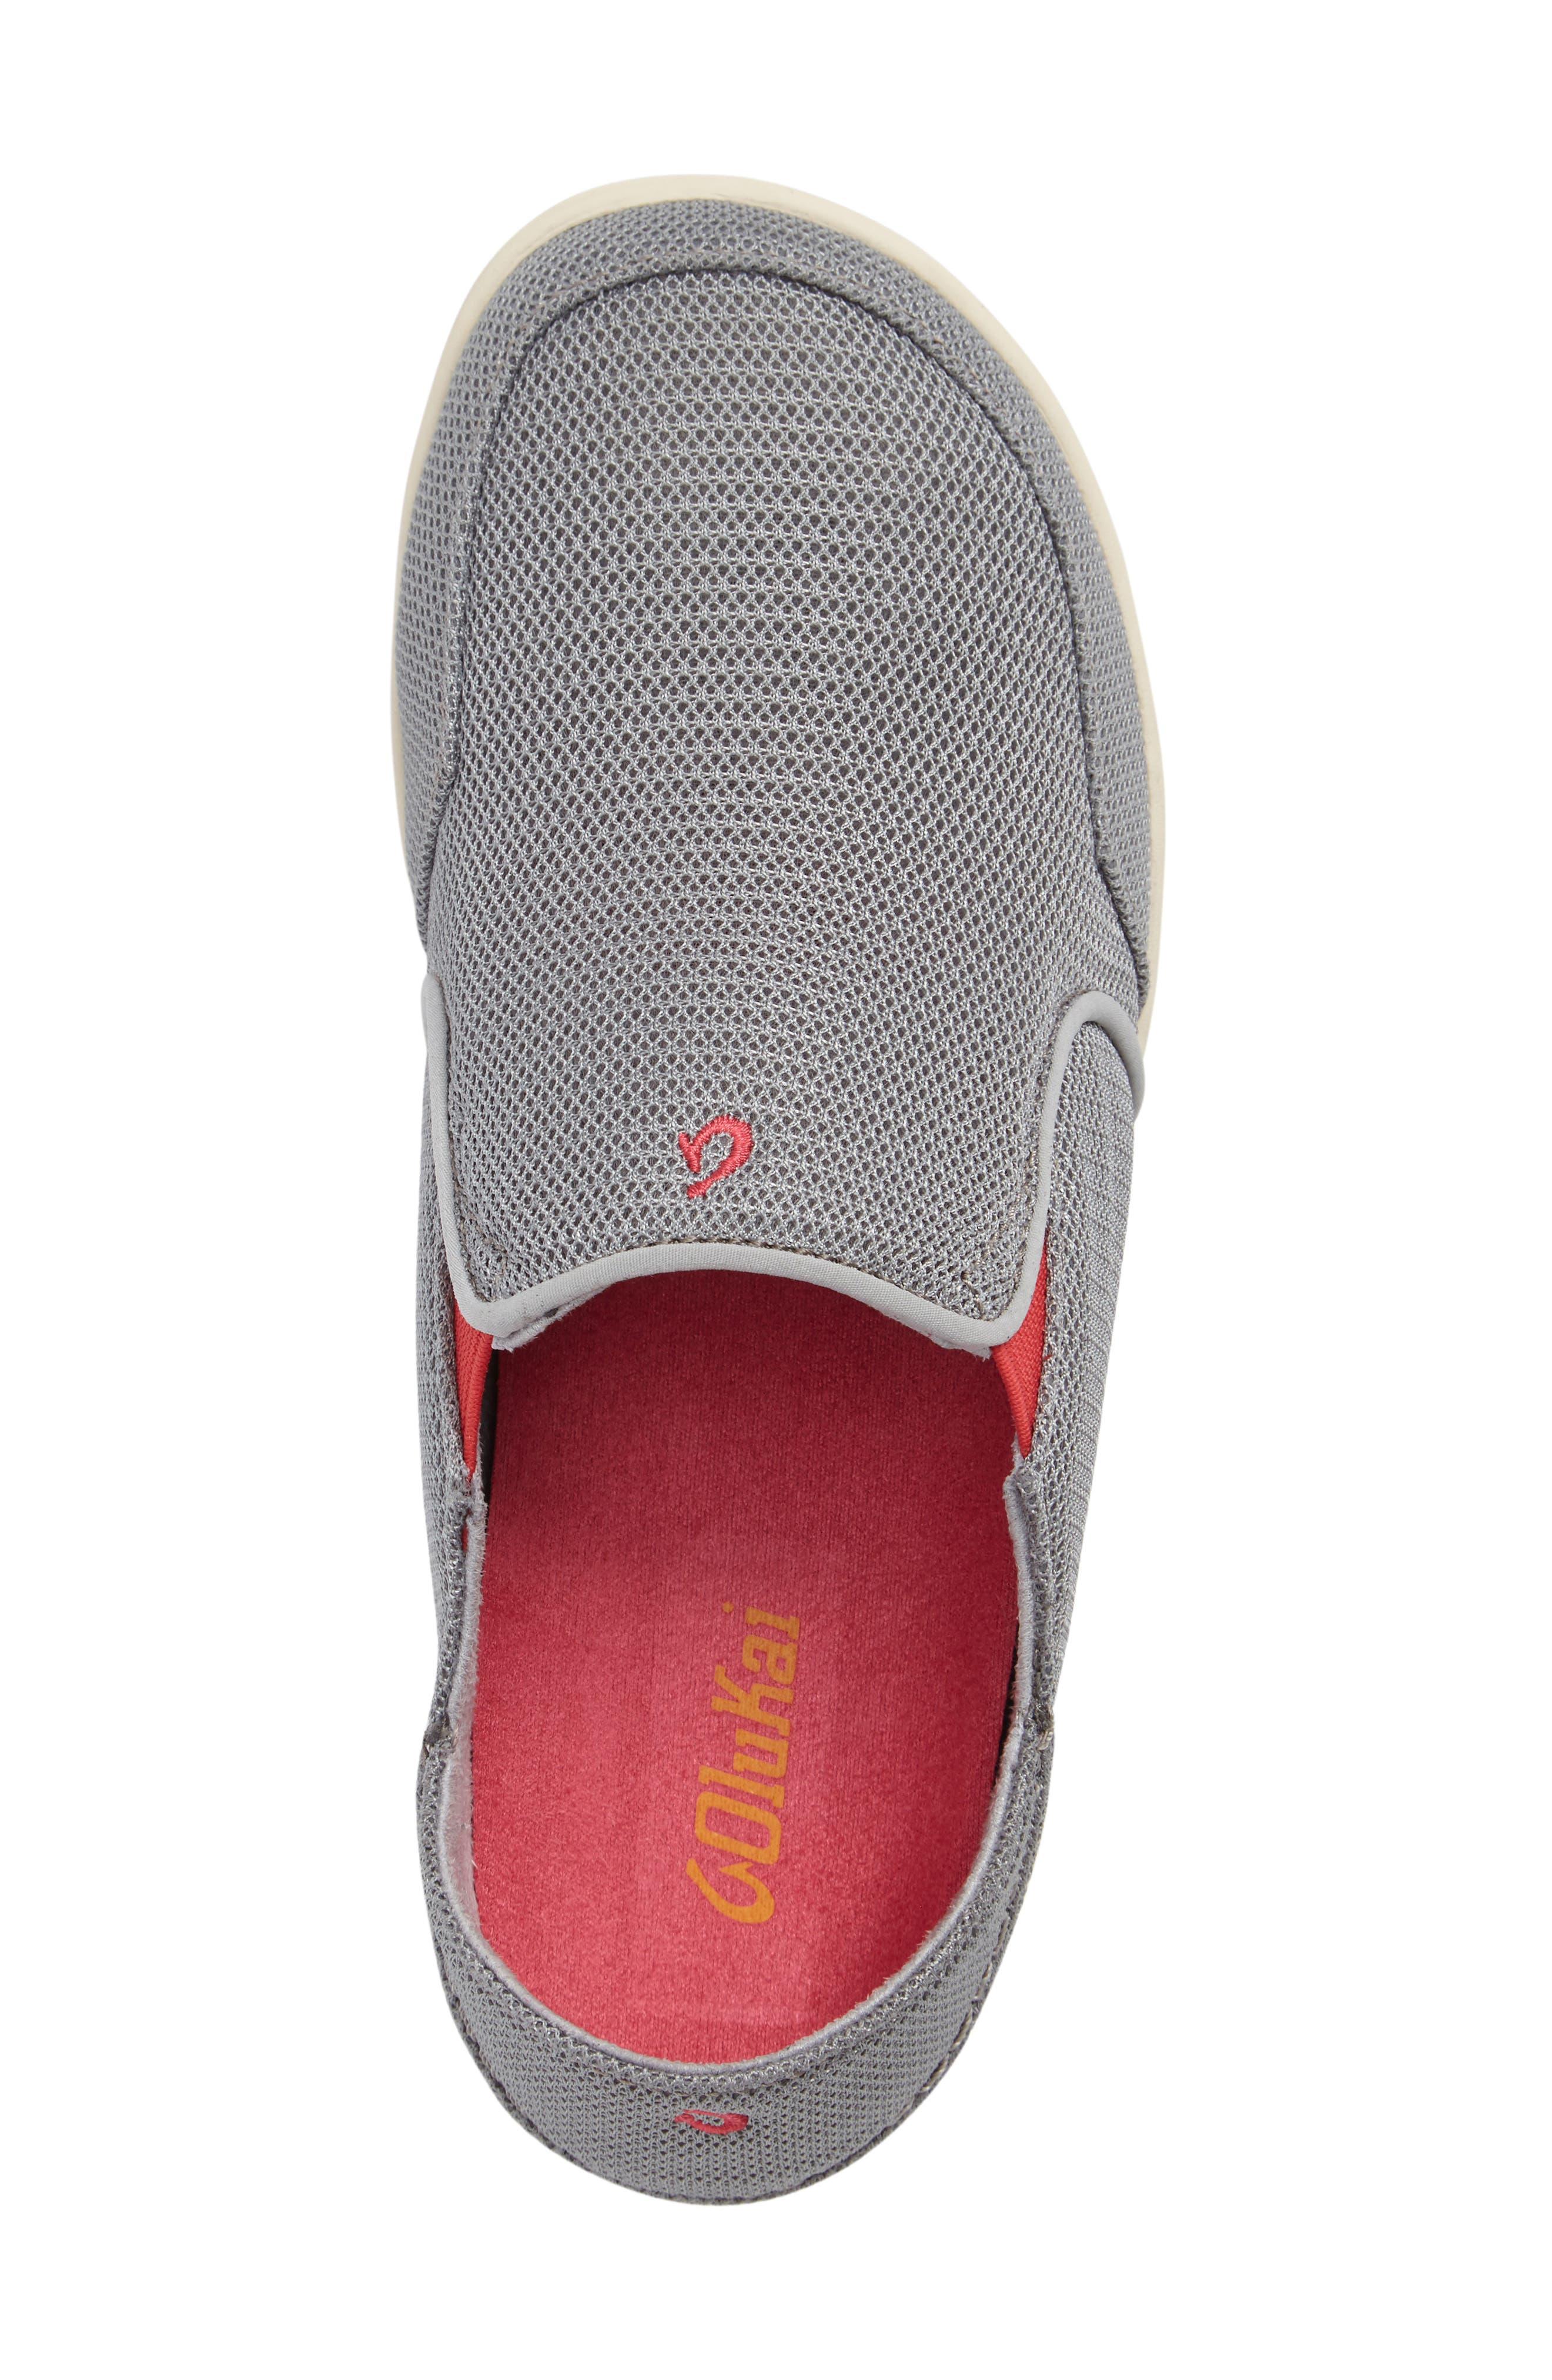 'Nohea' Mesh Shoe,                             Alternate thumbnail 3, color,                             PALE GREY/ DARK HIBISCUS